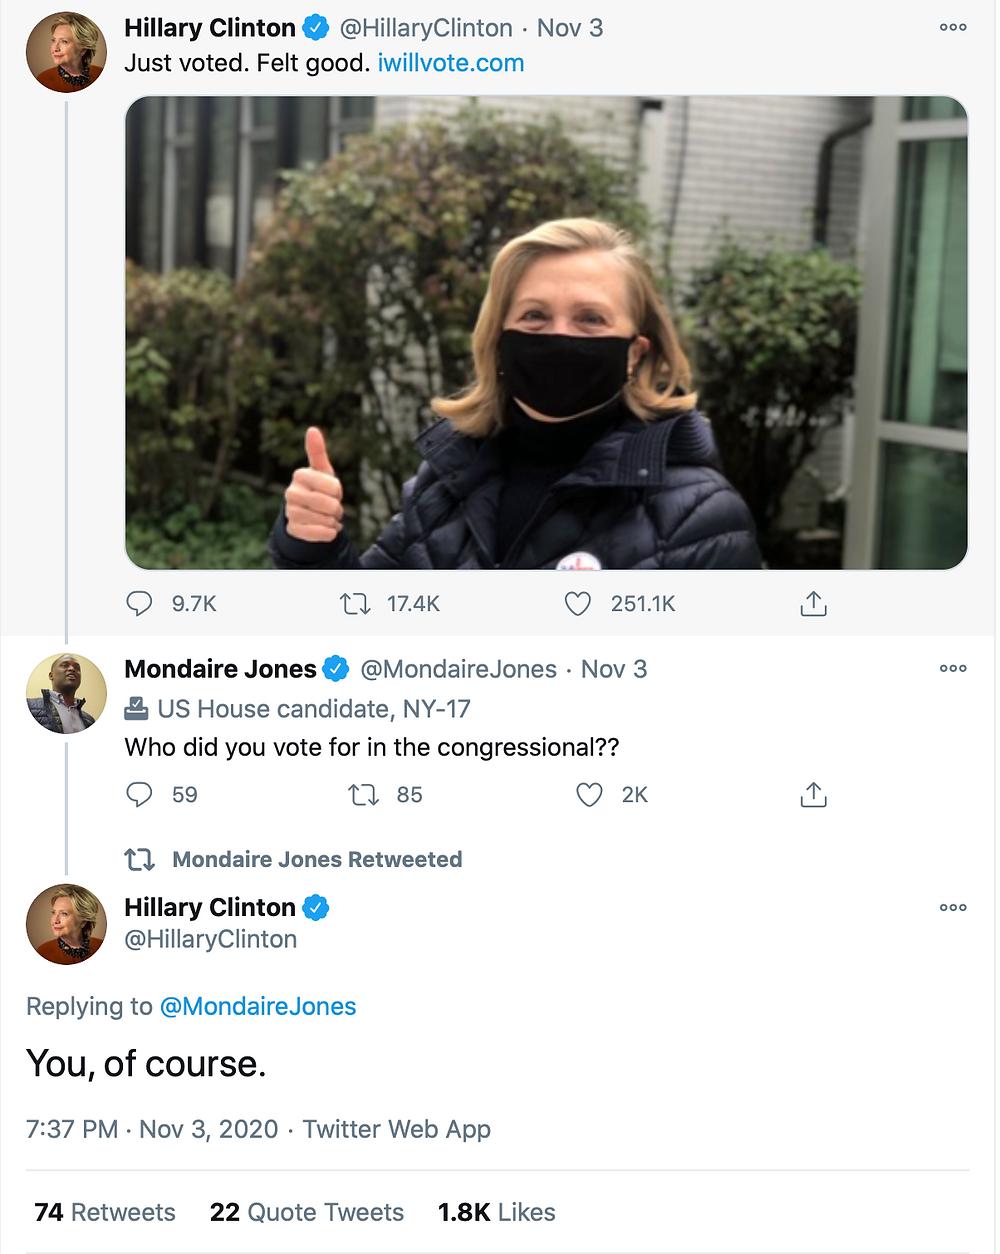 https://twitter.com/HillaryClinton/status/1323786314270101504